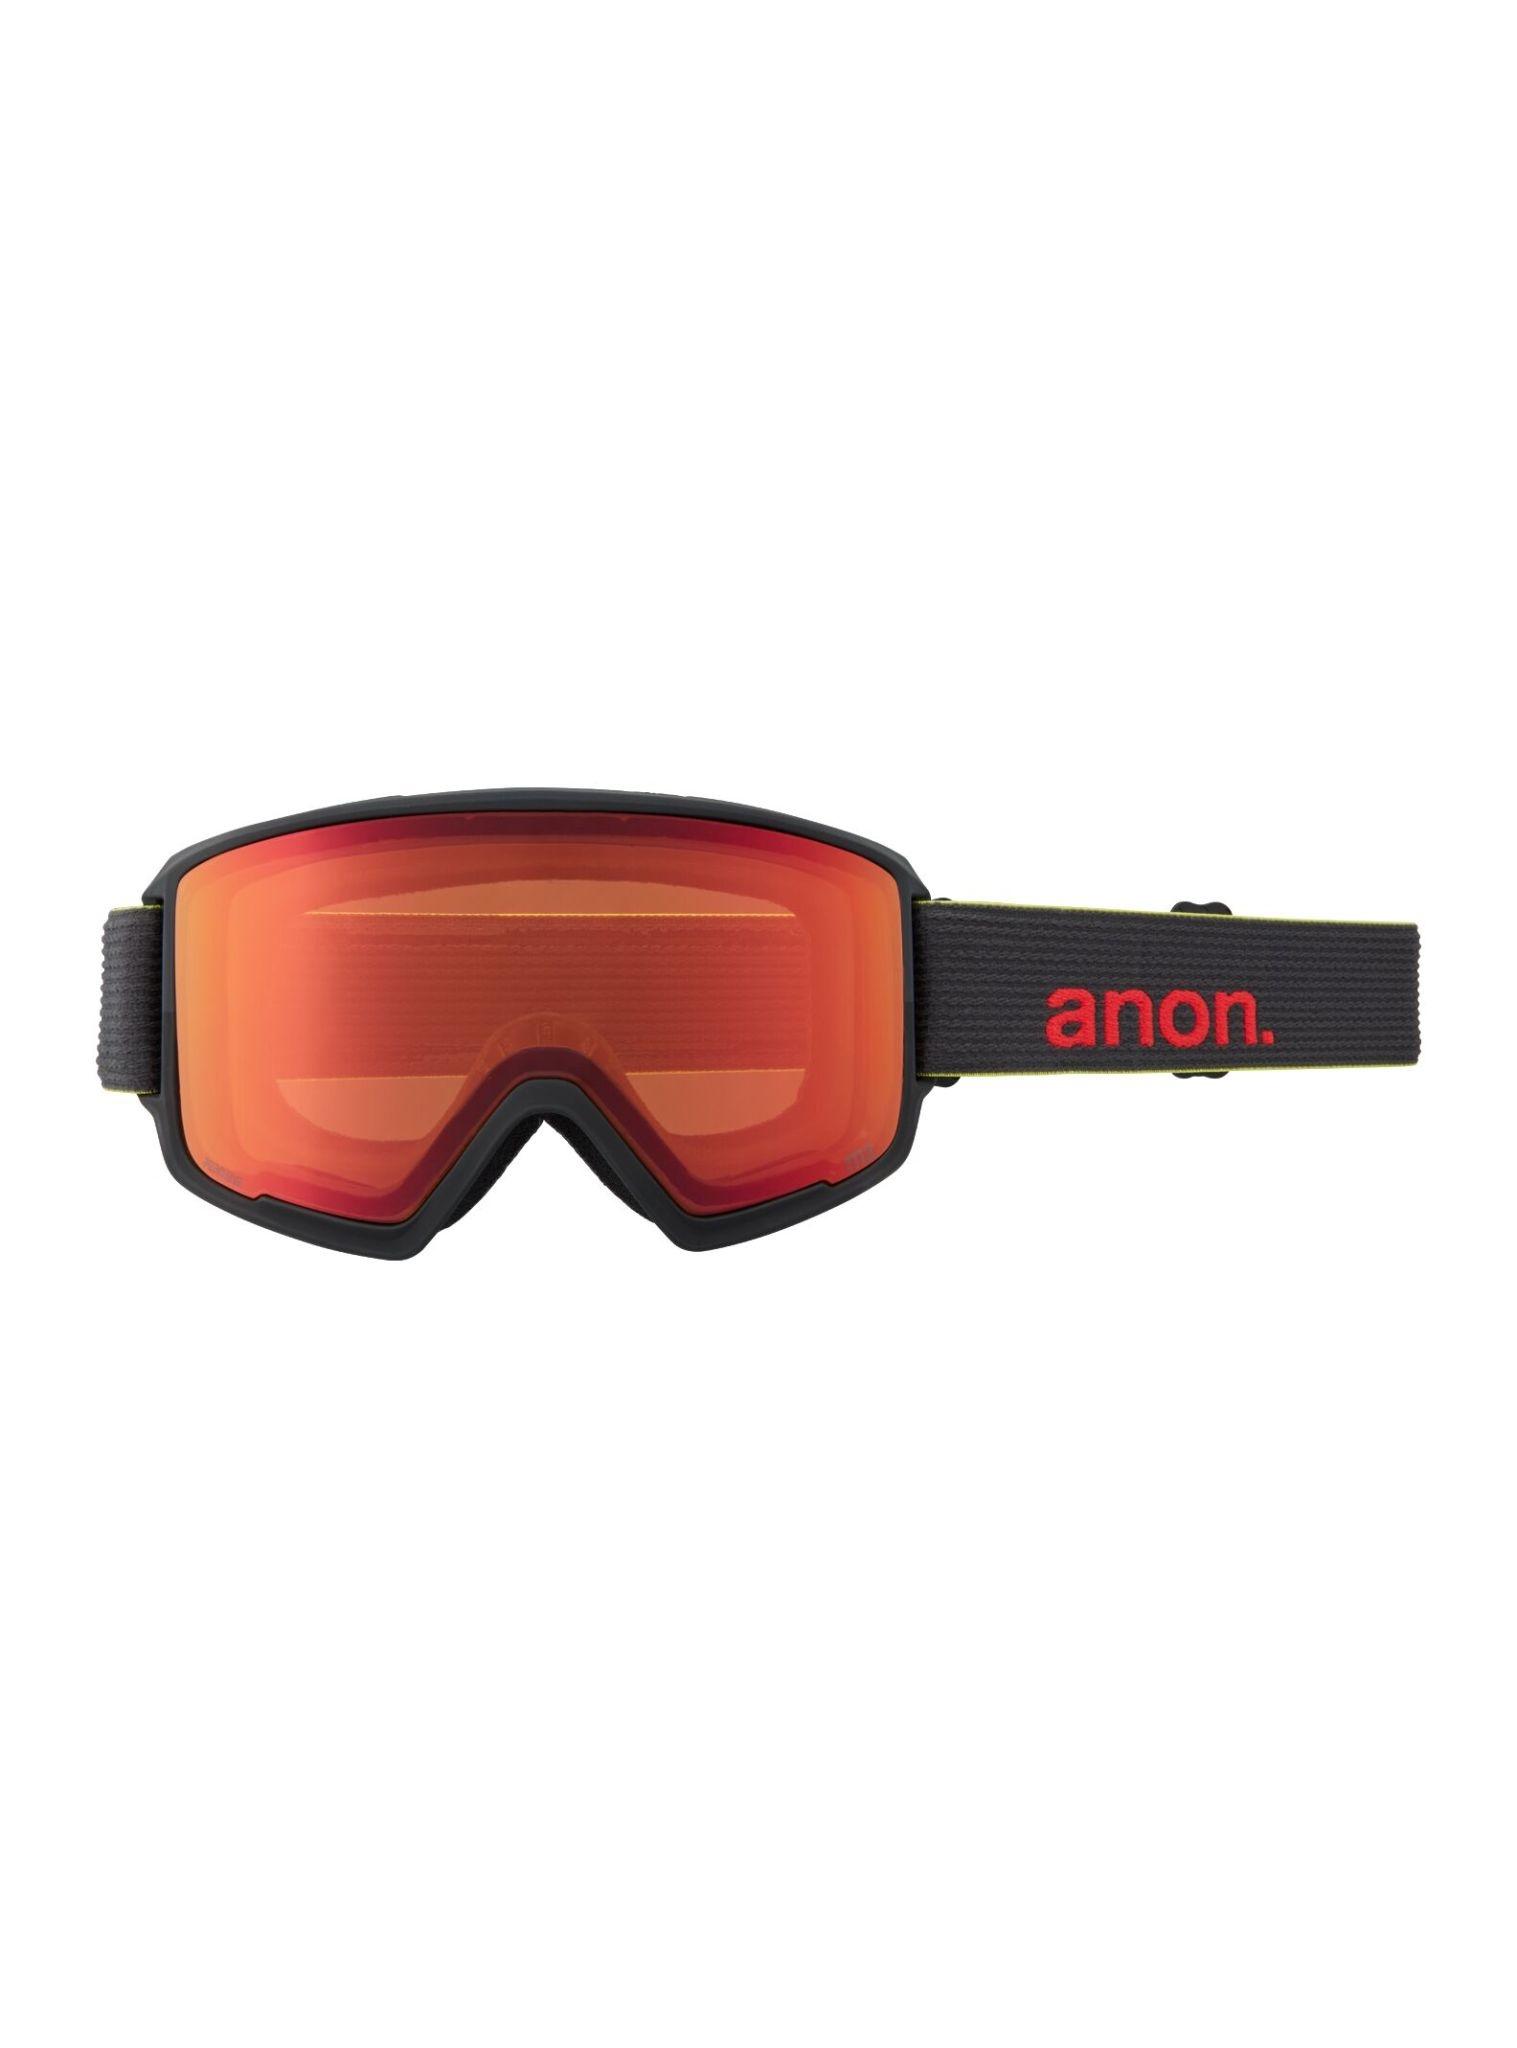 Anon. Anon Men's M3 Goggle + Bonus Lens